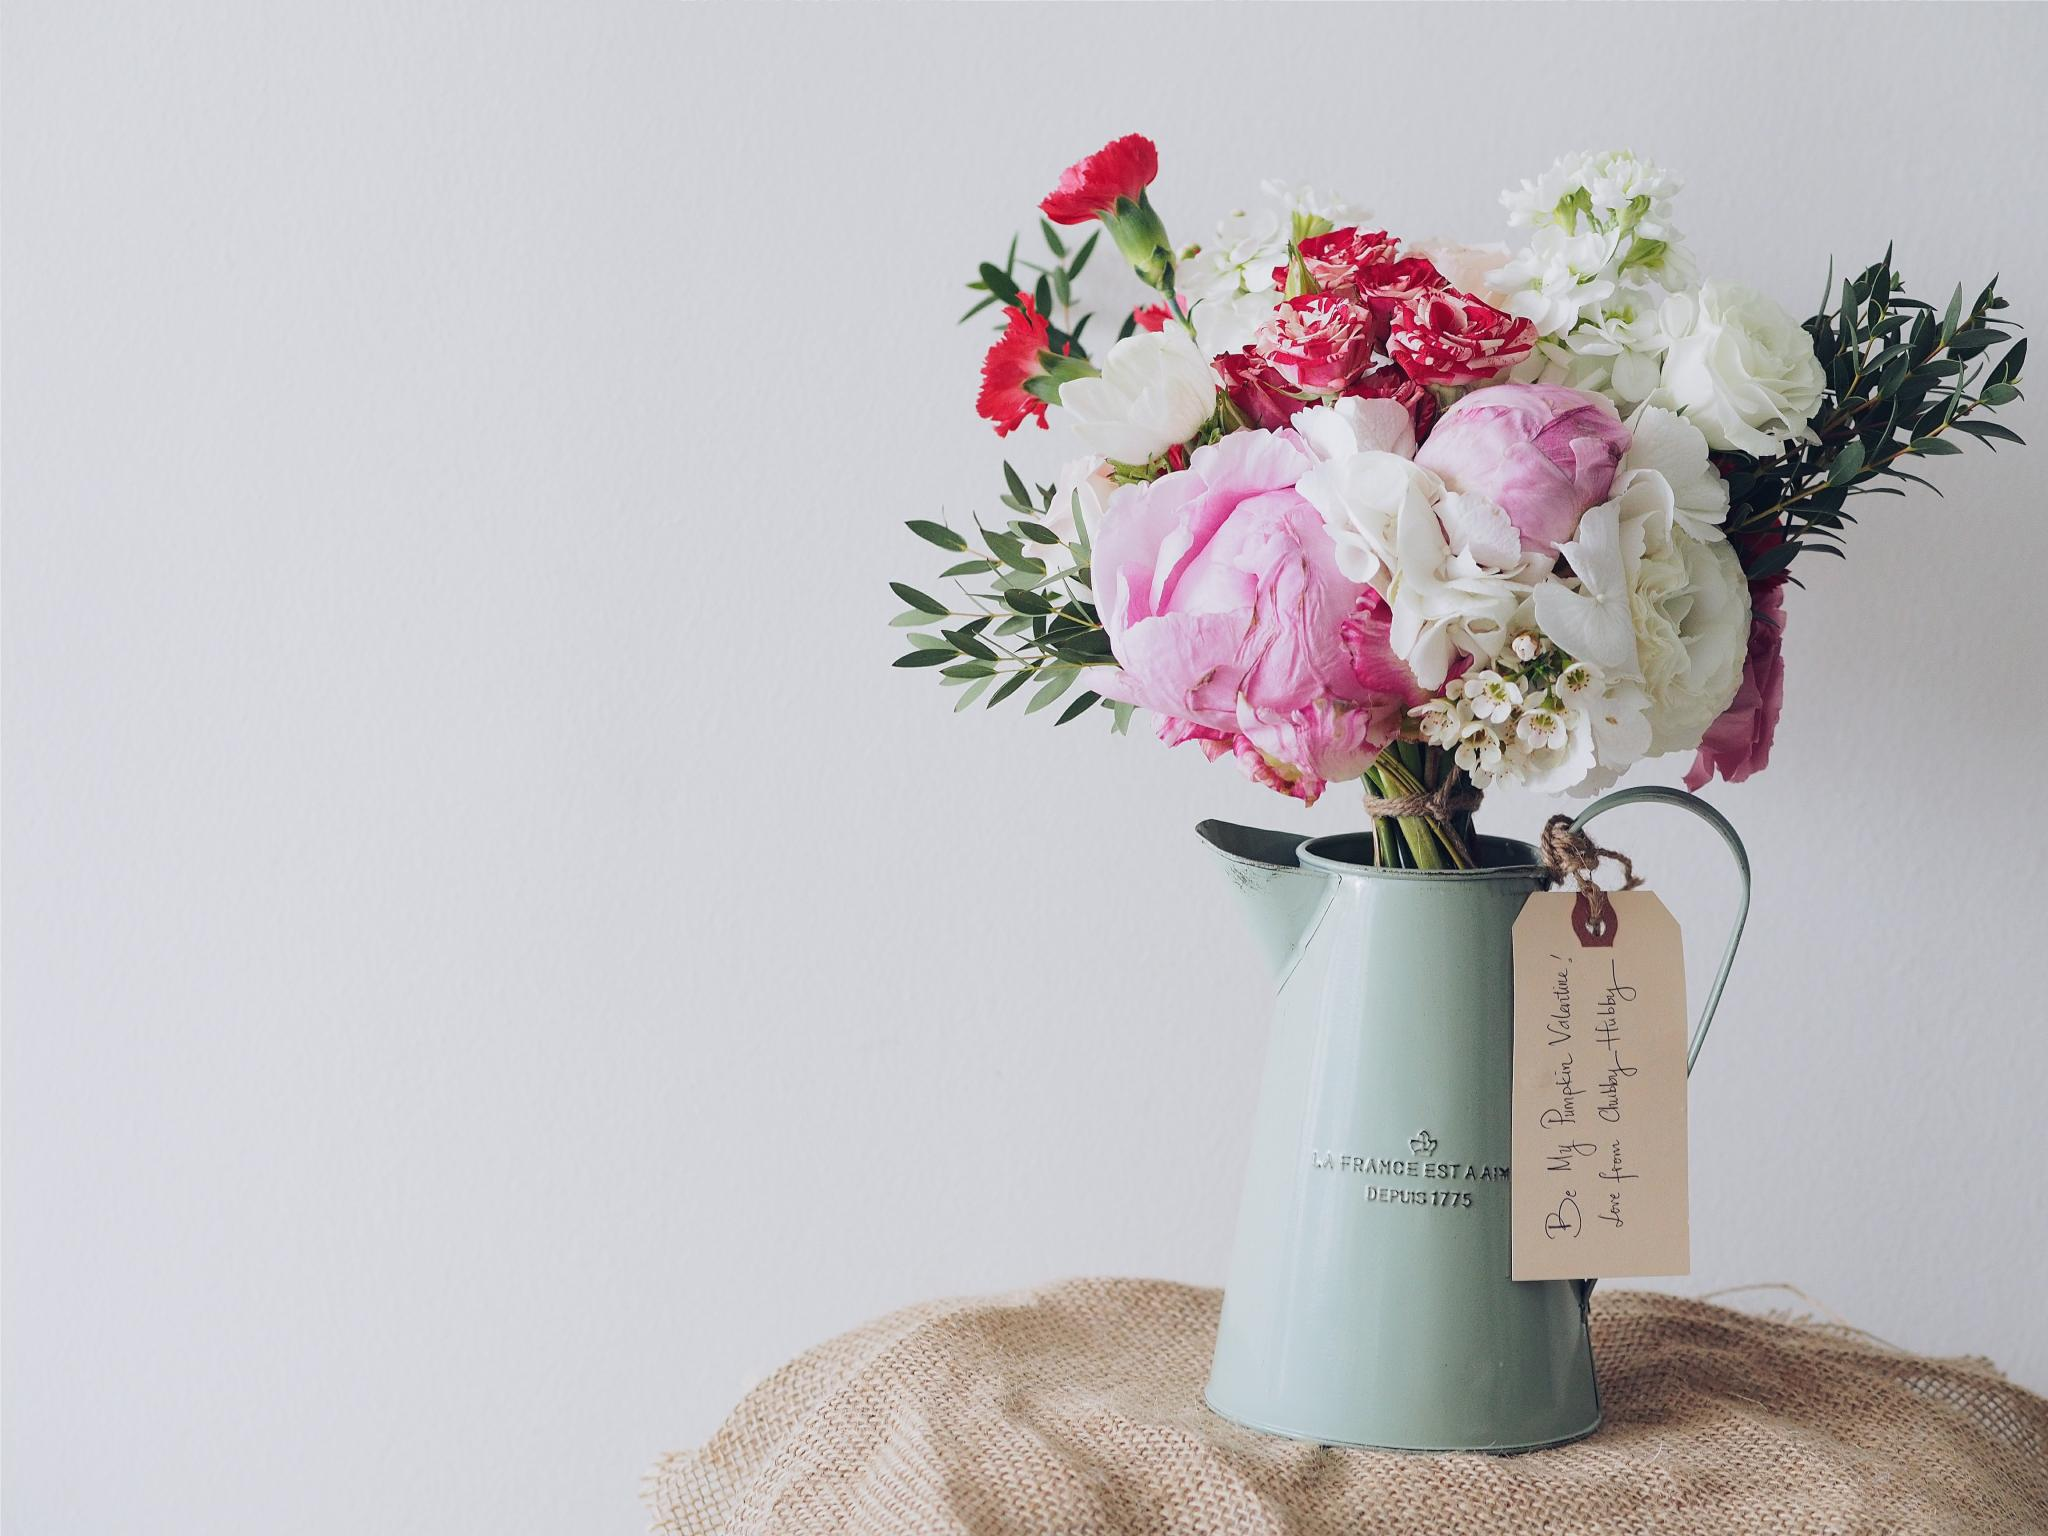 buquet of flowers